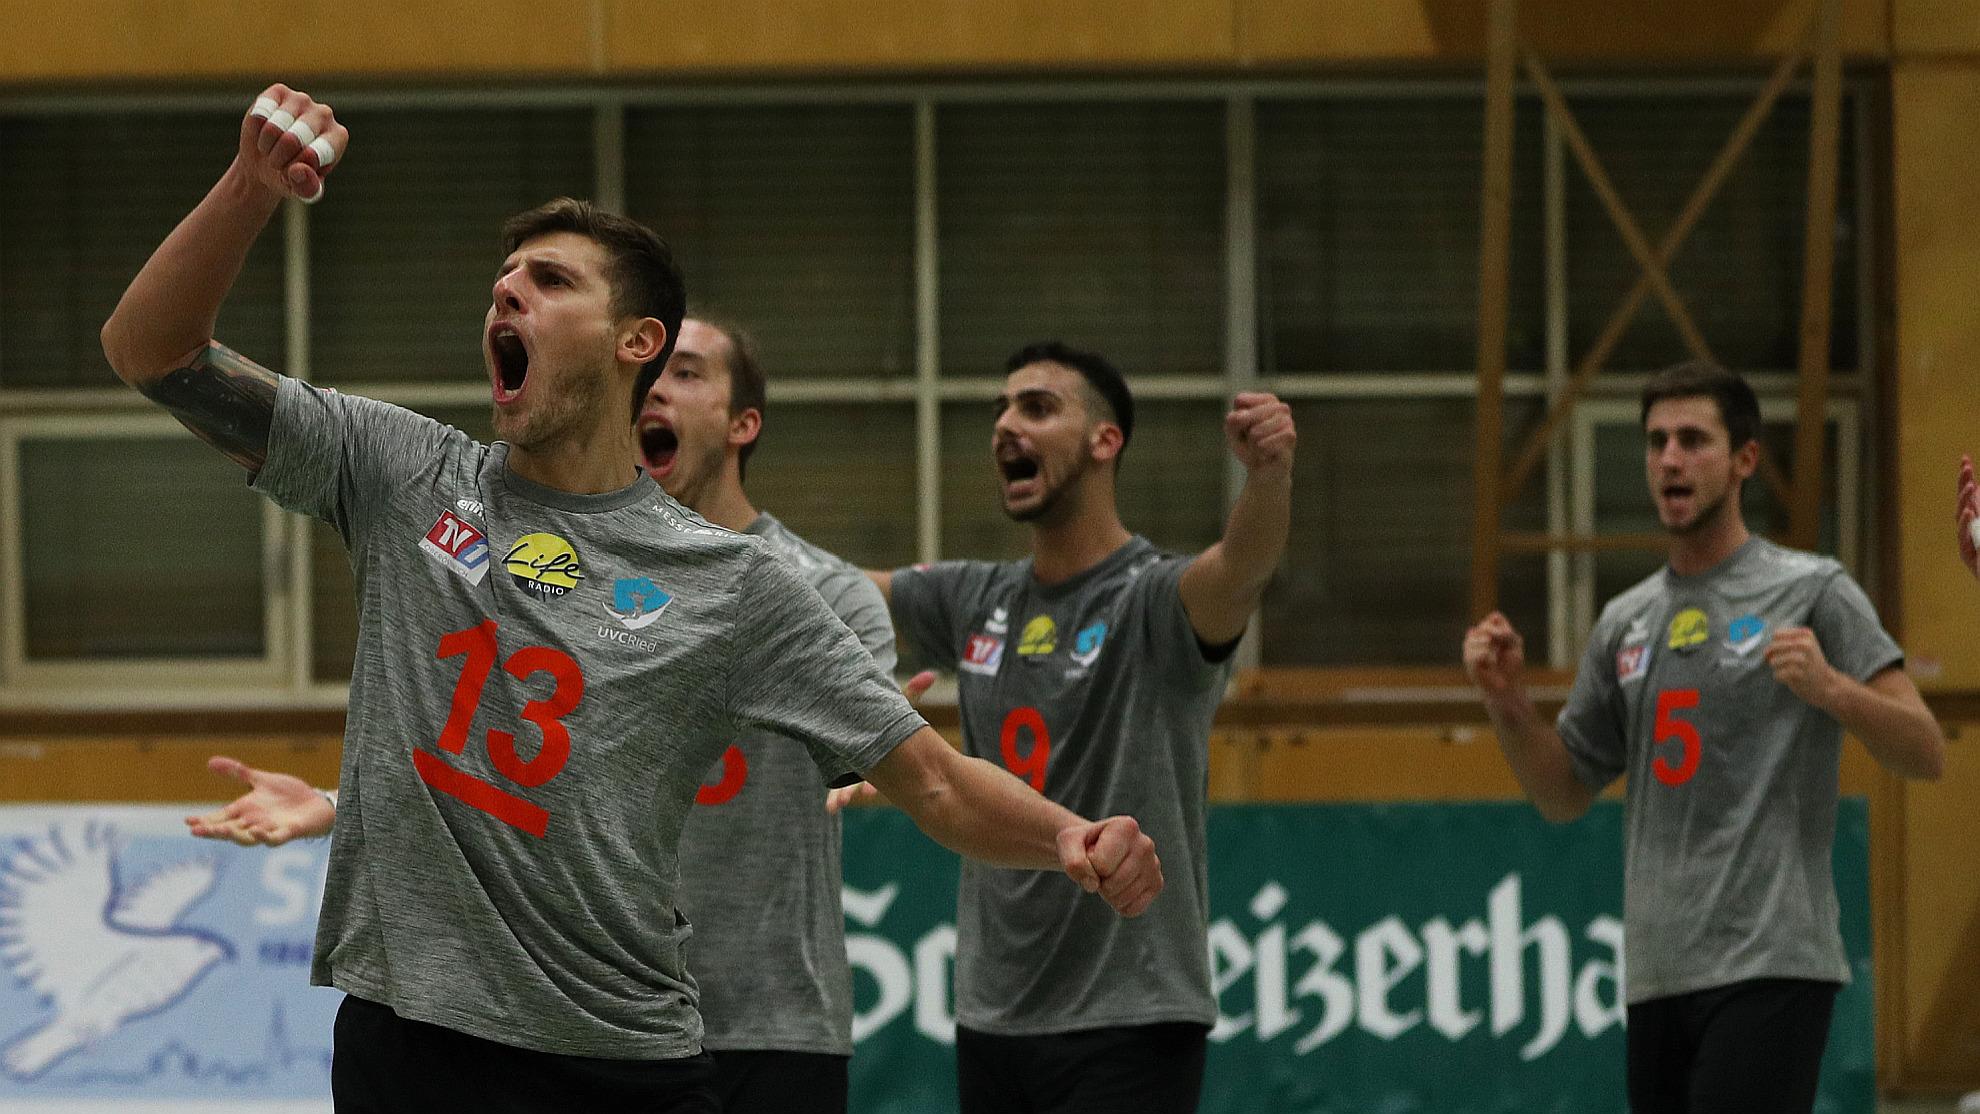 UVC Weberzeile Ried/Innkreis 2019 - FOTO © GEPA pictures/Christian Ort